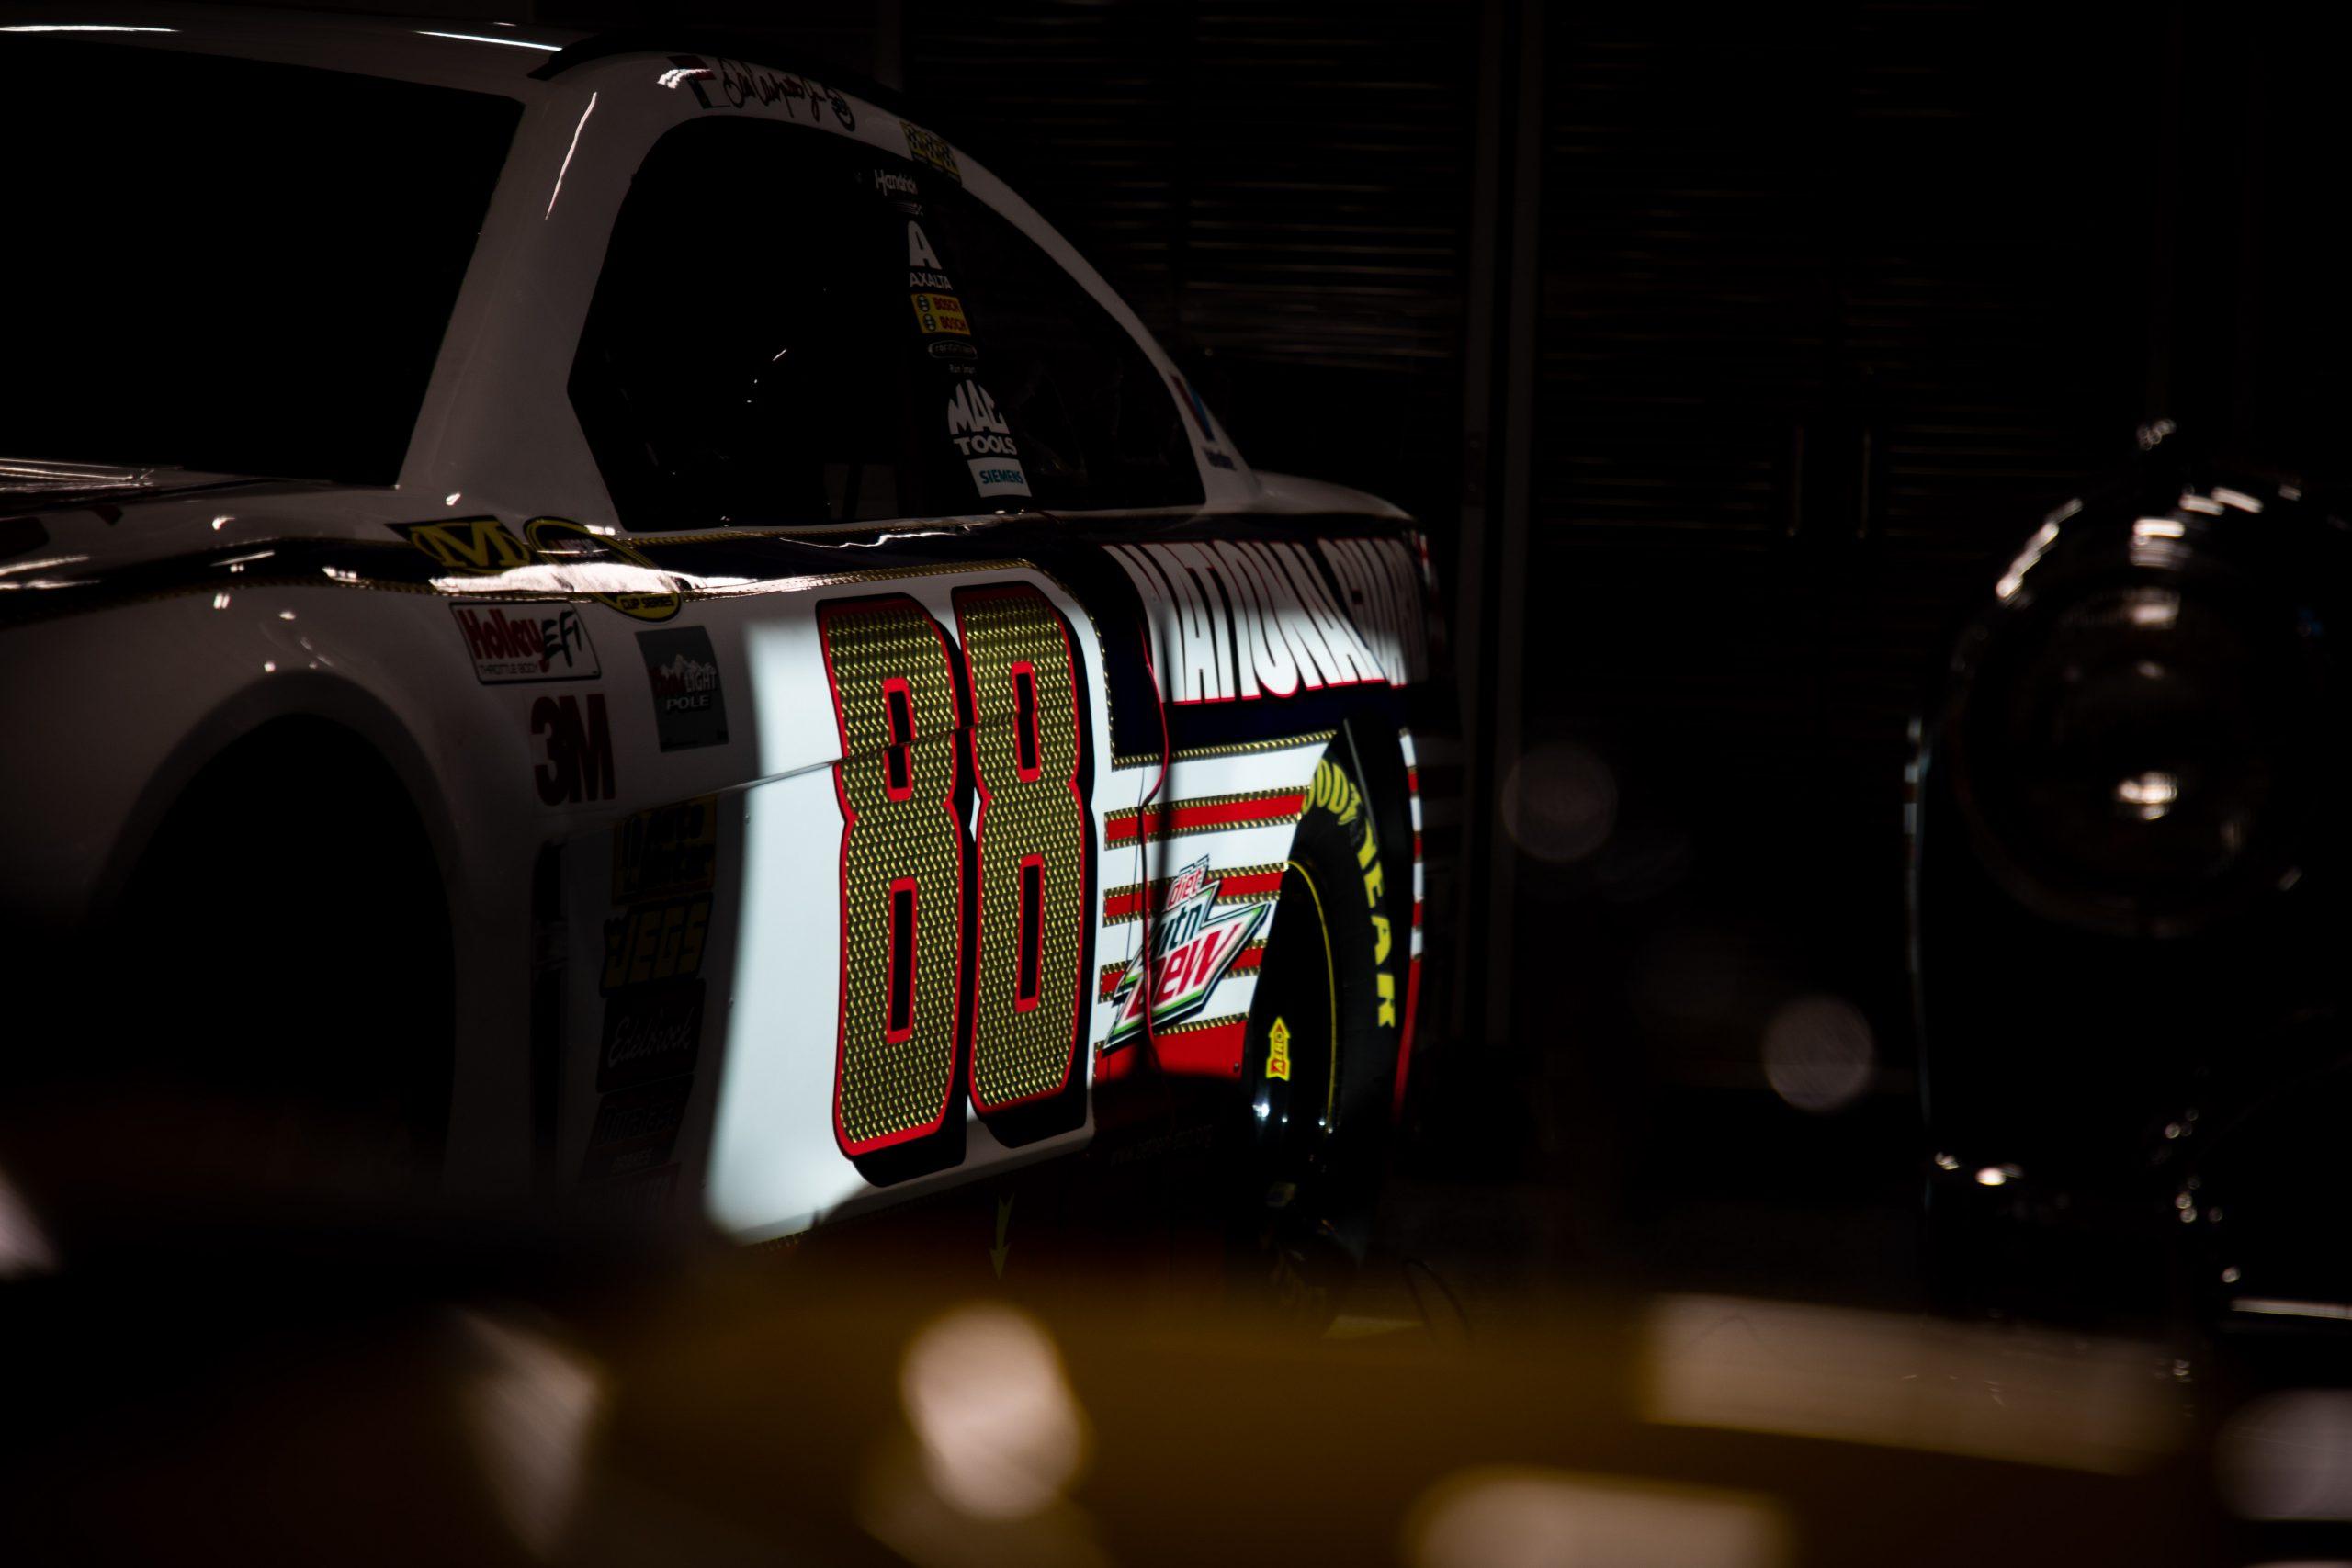 2012 Chevrolet Impala NASCAR Dale Earnhardt Jr Side